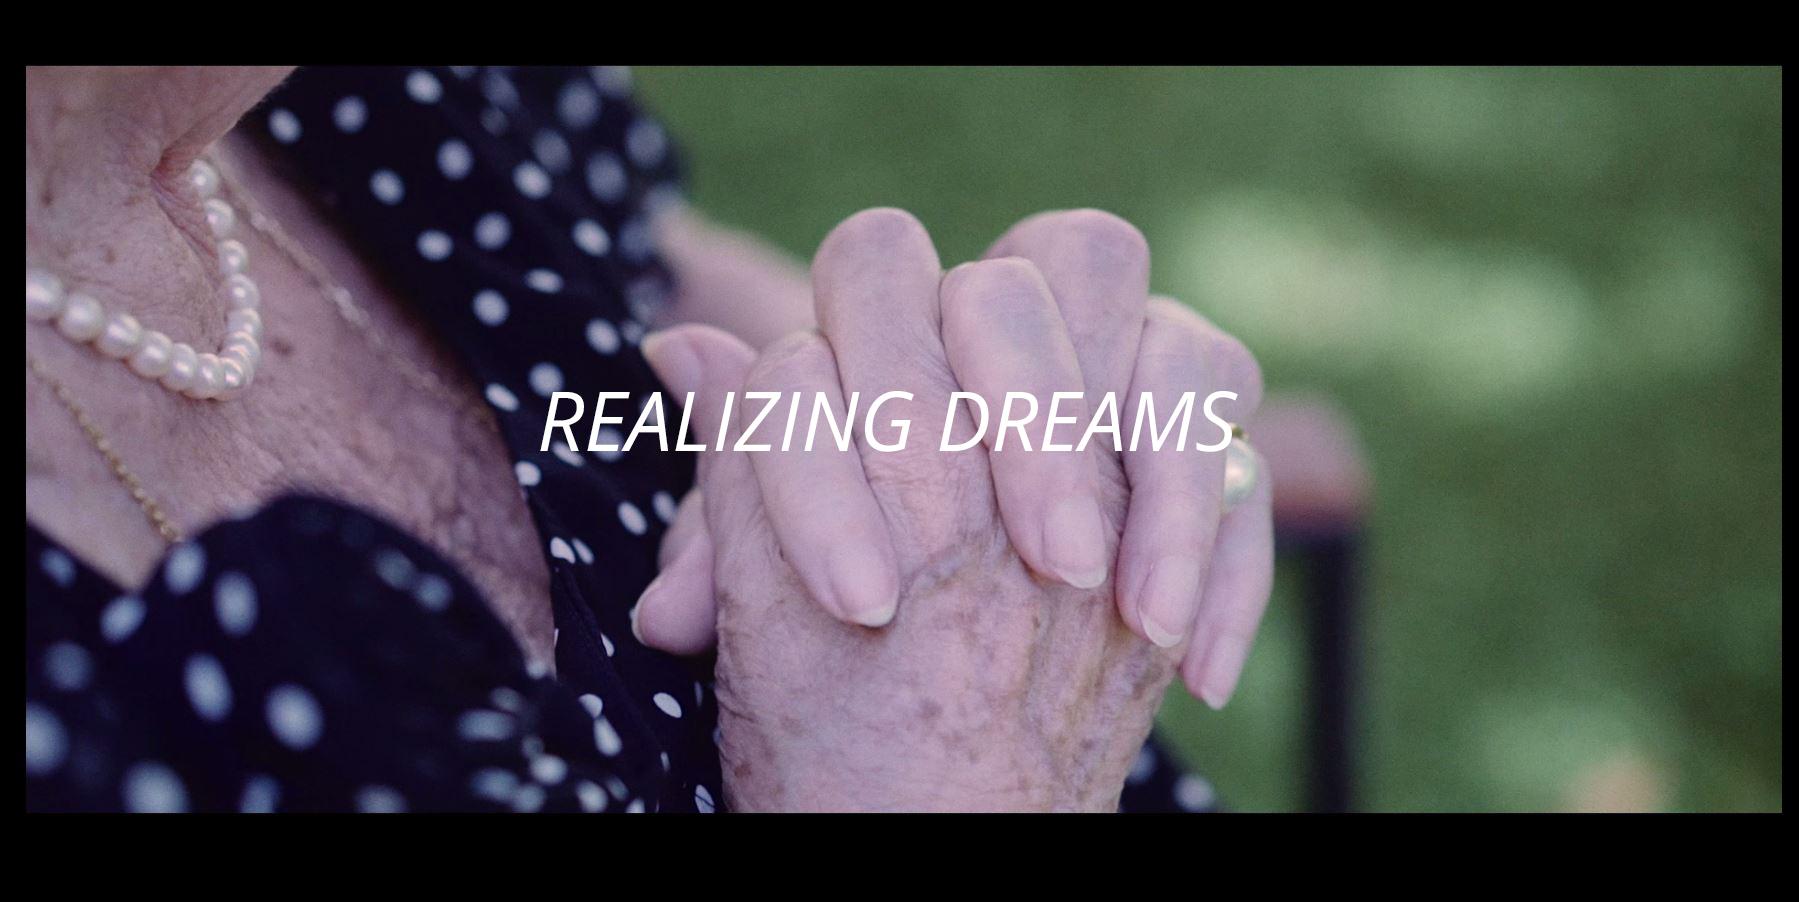 realizing-dreams-corporative-video-bronces-mestre